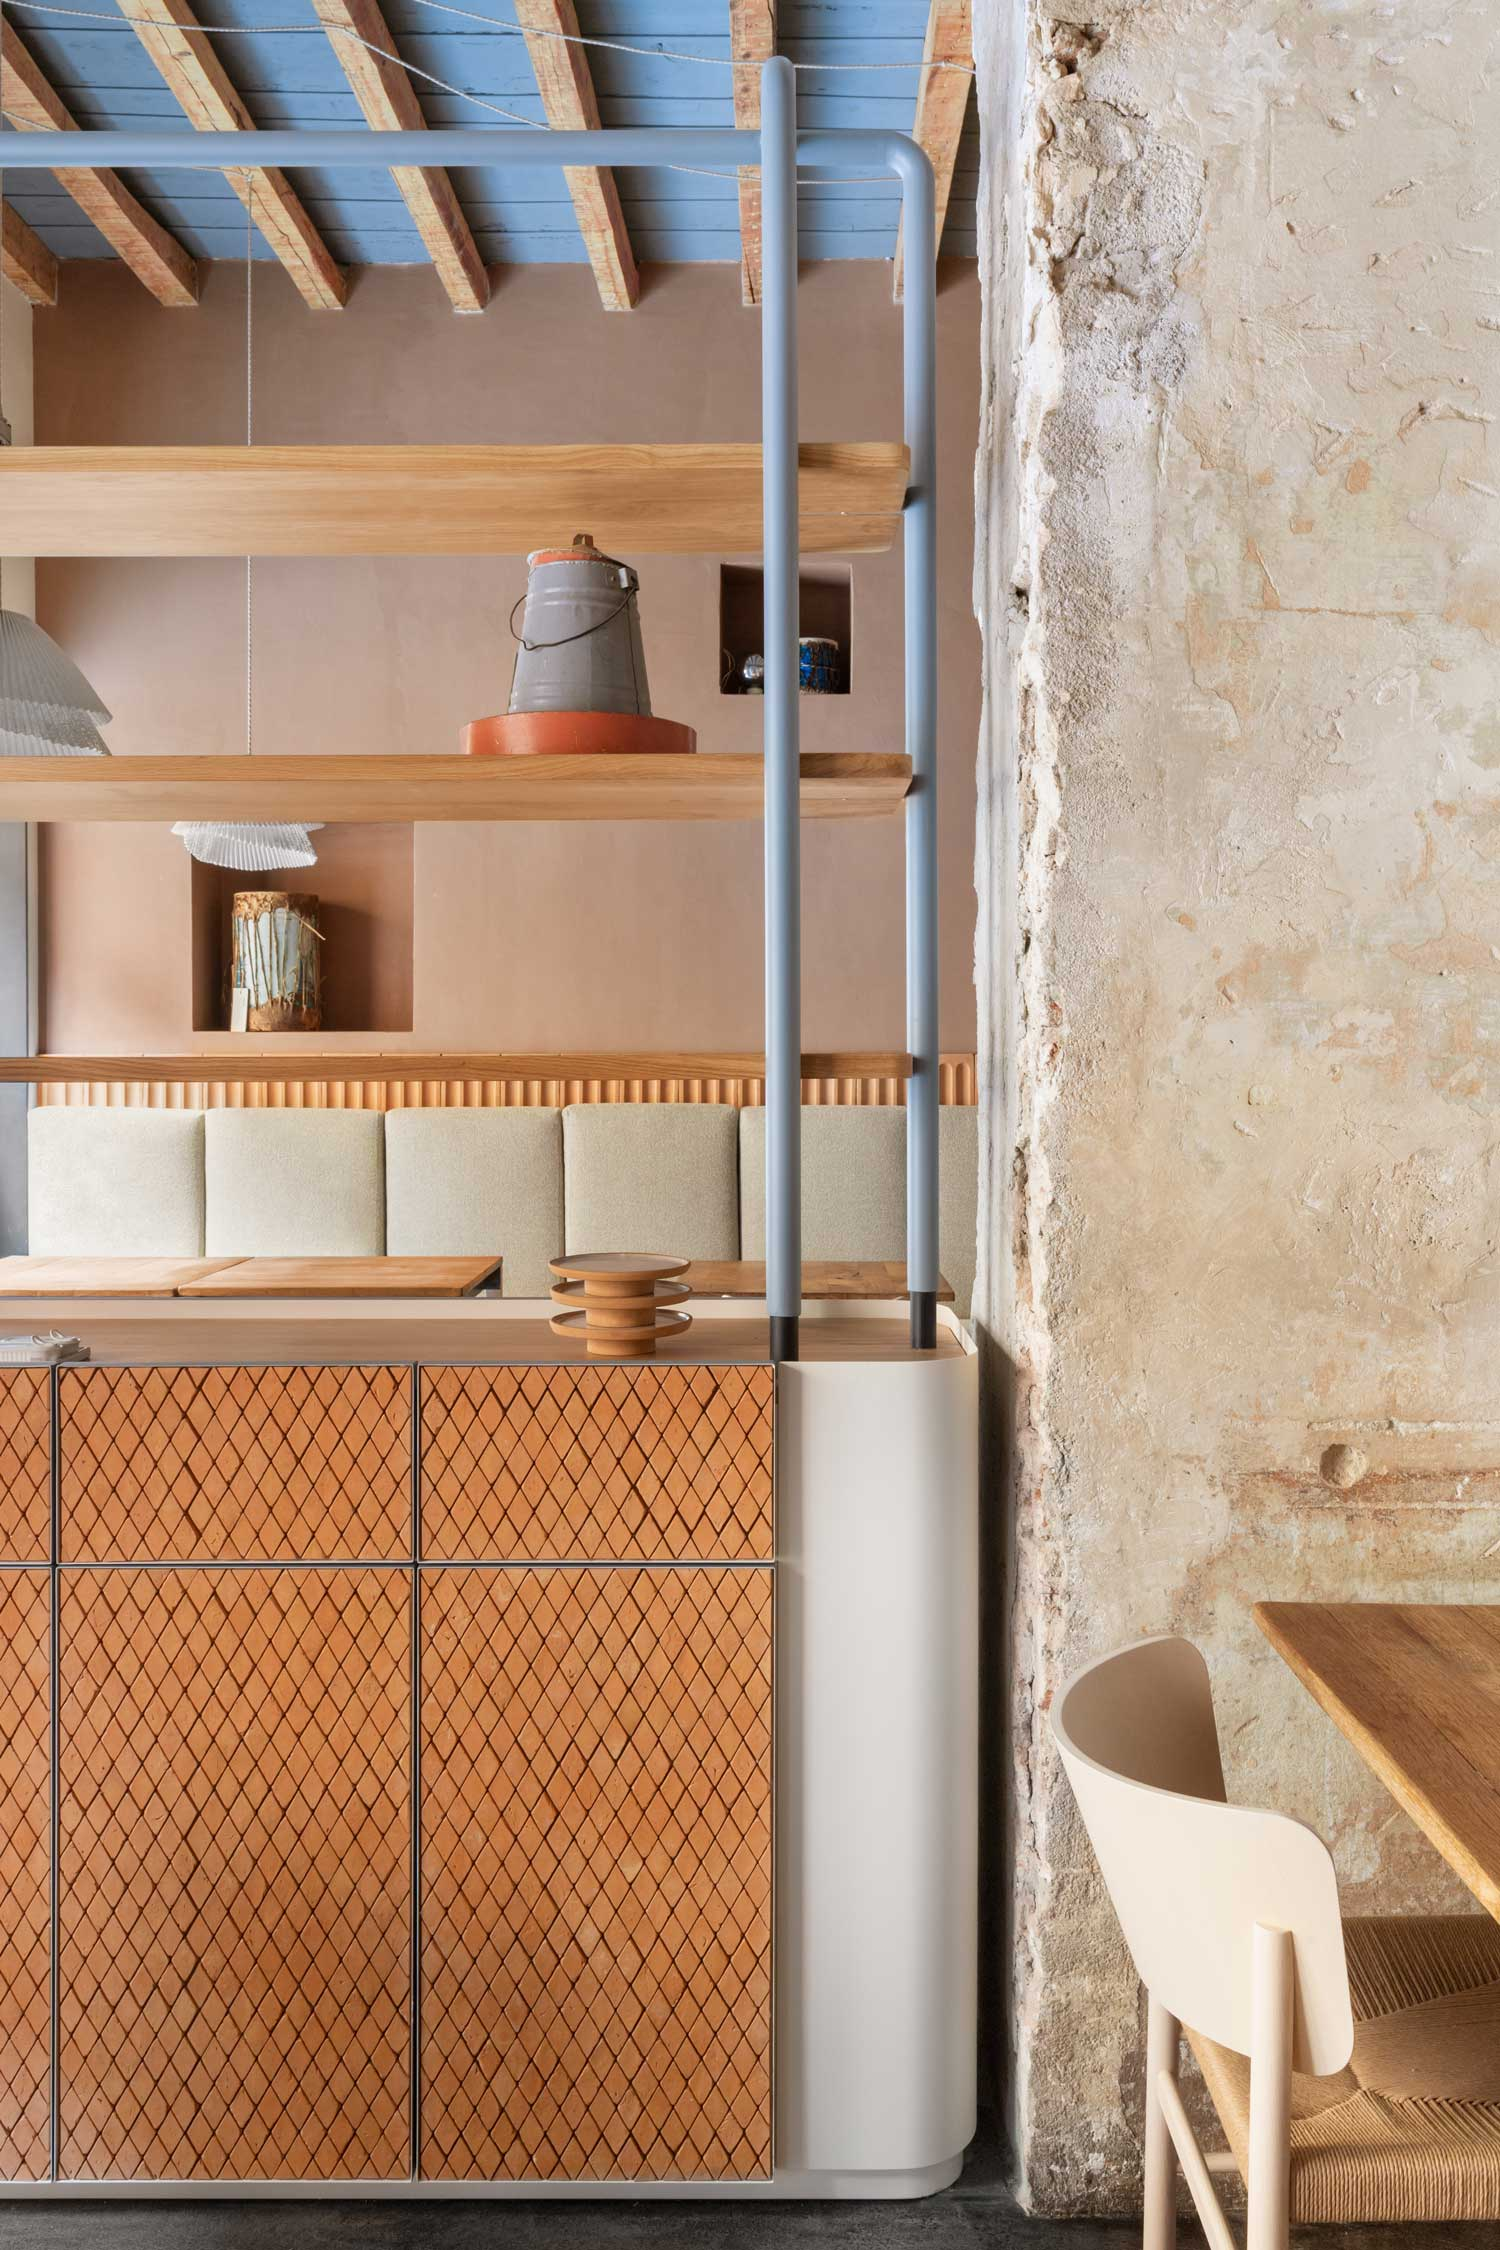 28 Posti Restaurant Renovation Milan By Cristina Celestino Yellowtrace 06